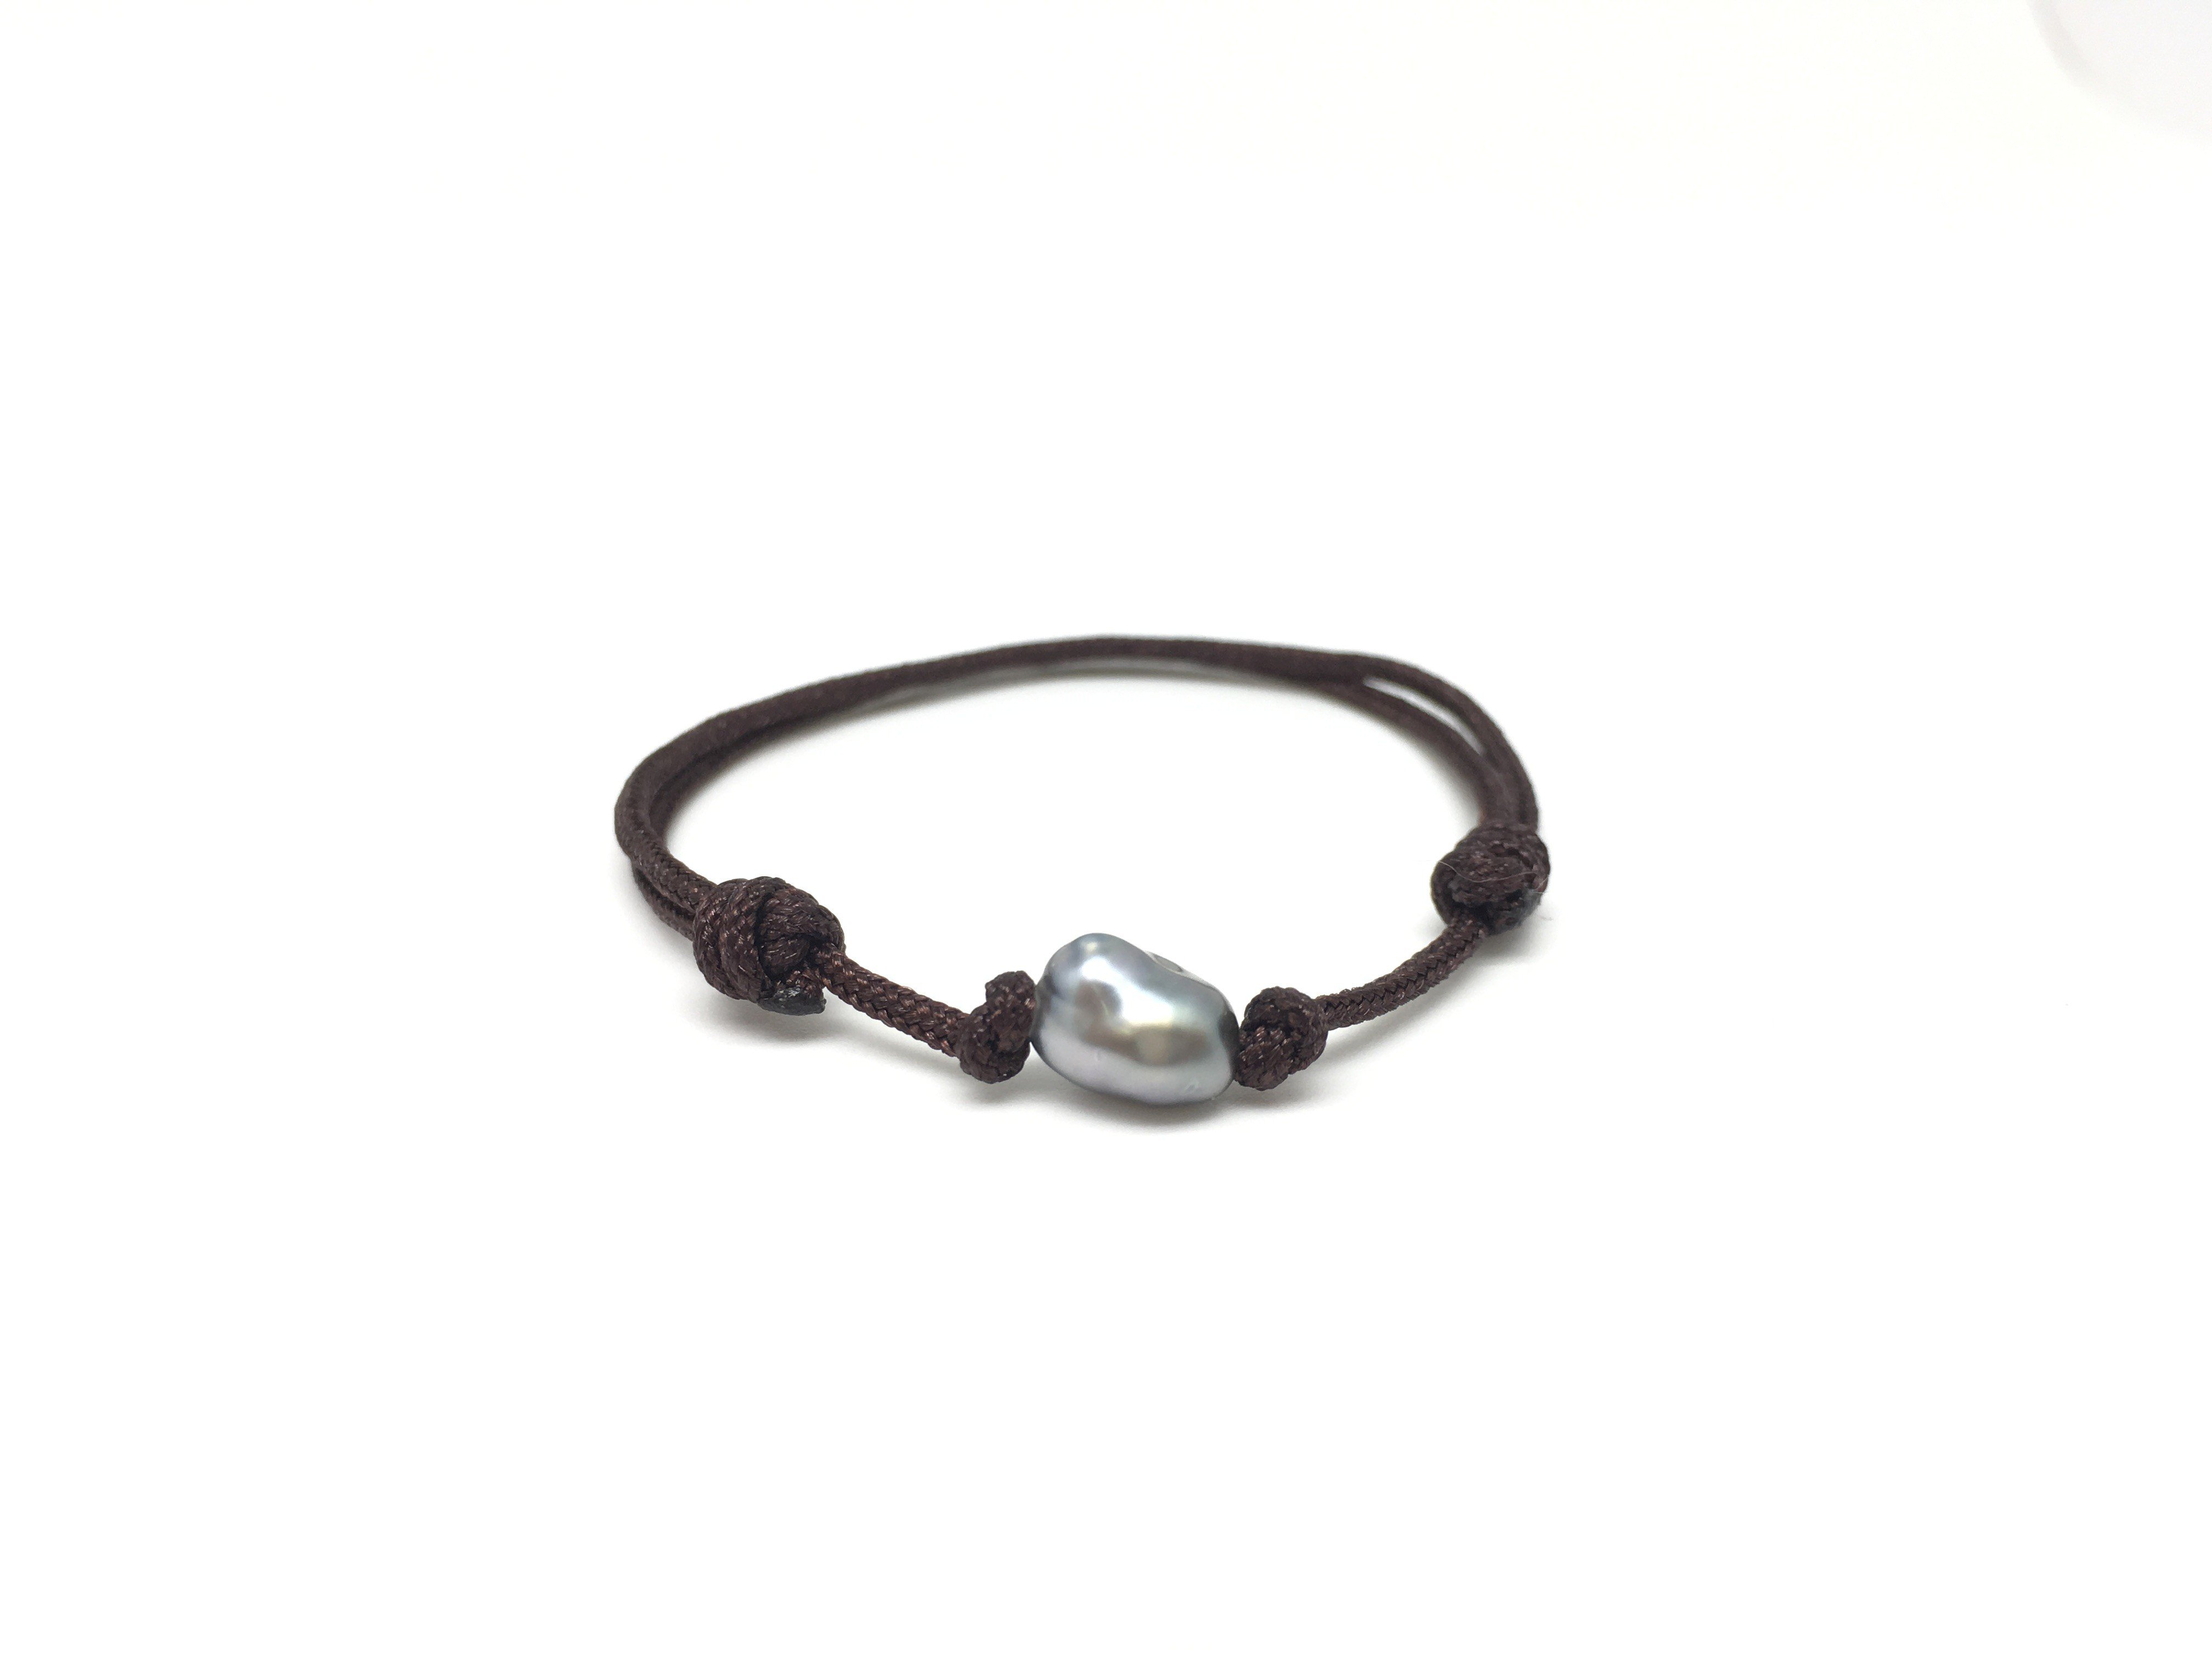 Bracelet BB keishi - Marron foncé